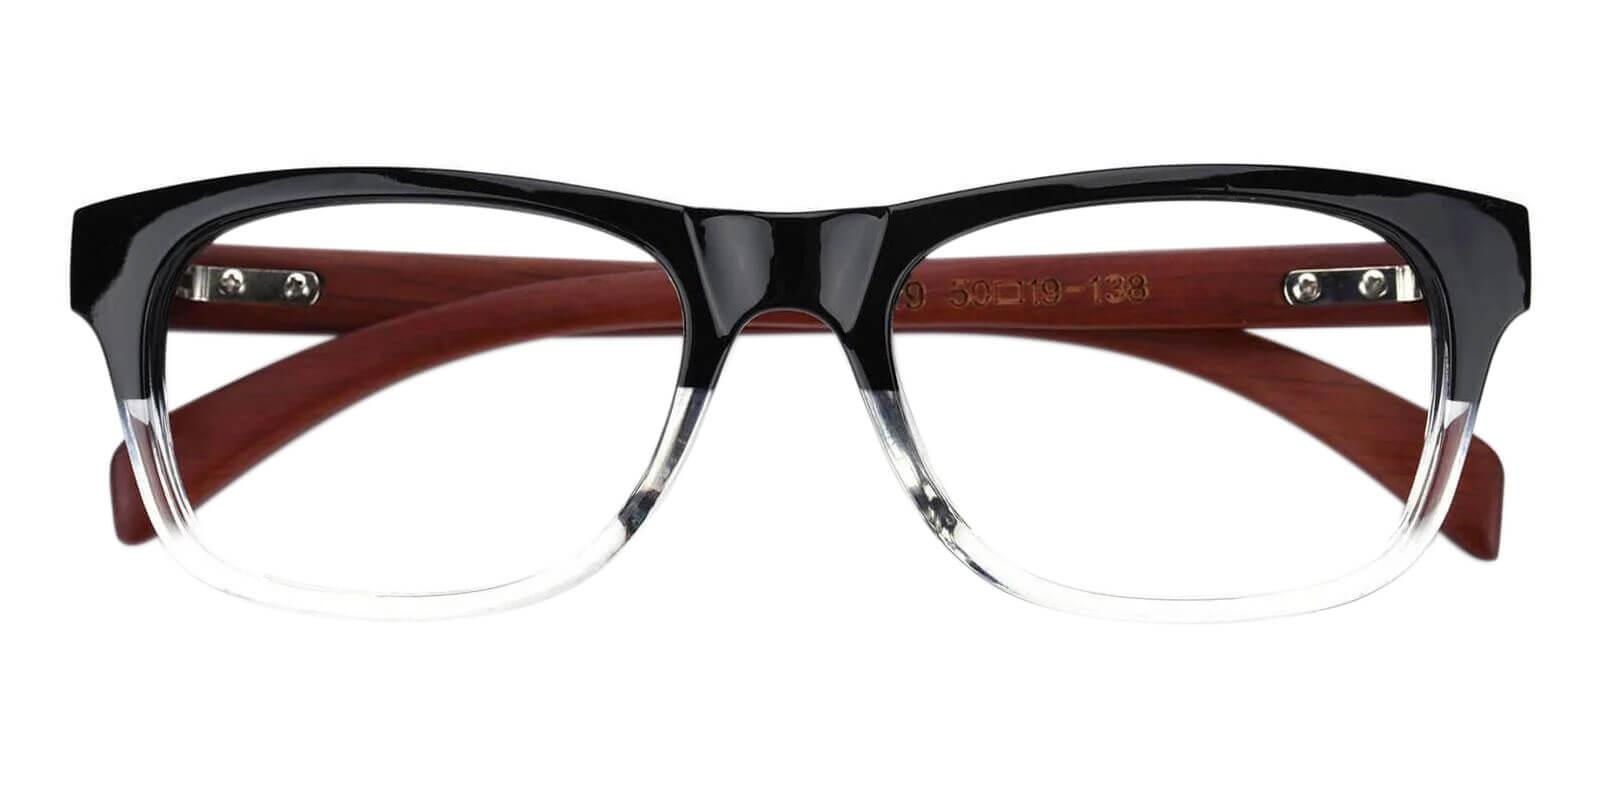 Germantown Multicolor Acetate Eyeglasses , UniversalBridgeFit Frames from ABBE Glasses